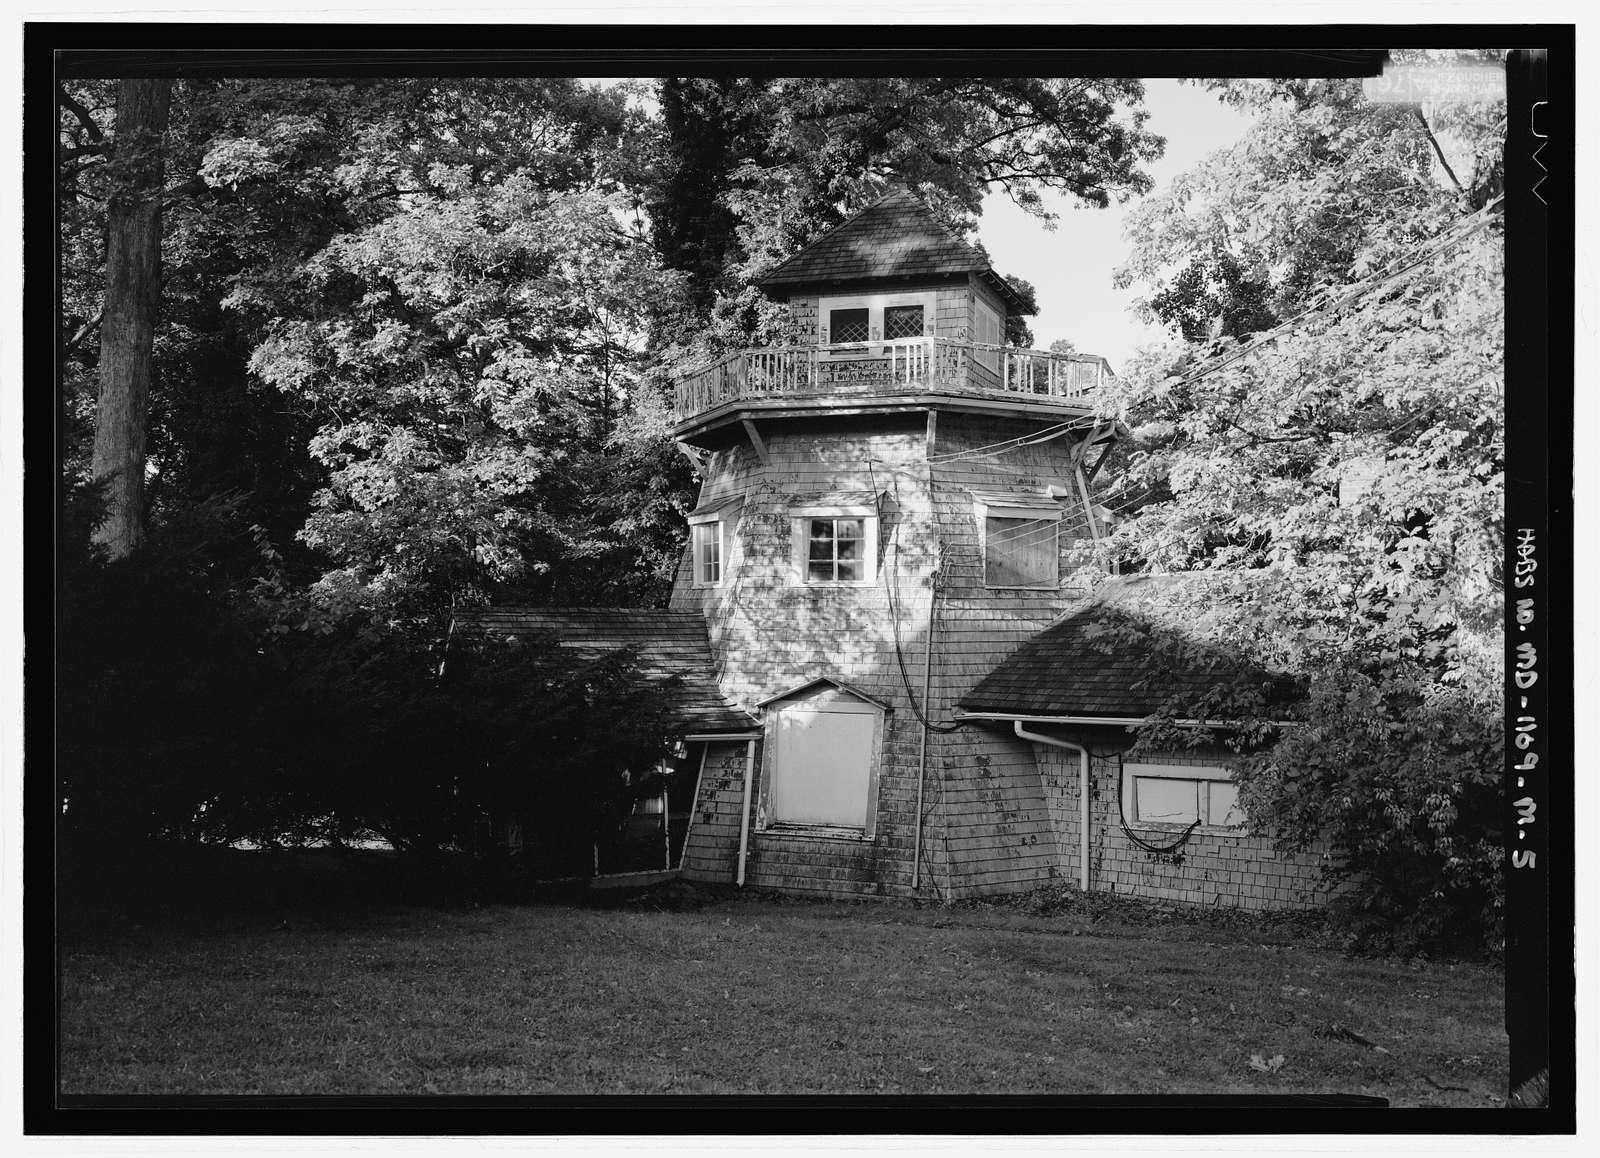 National Park Seminary, Dutch Windmill, 2750 Dewitt Circle, Silver Spring, Montgomery County, MD